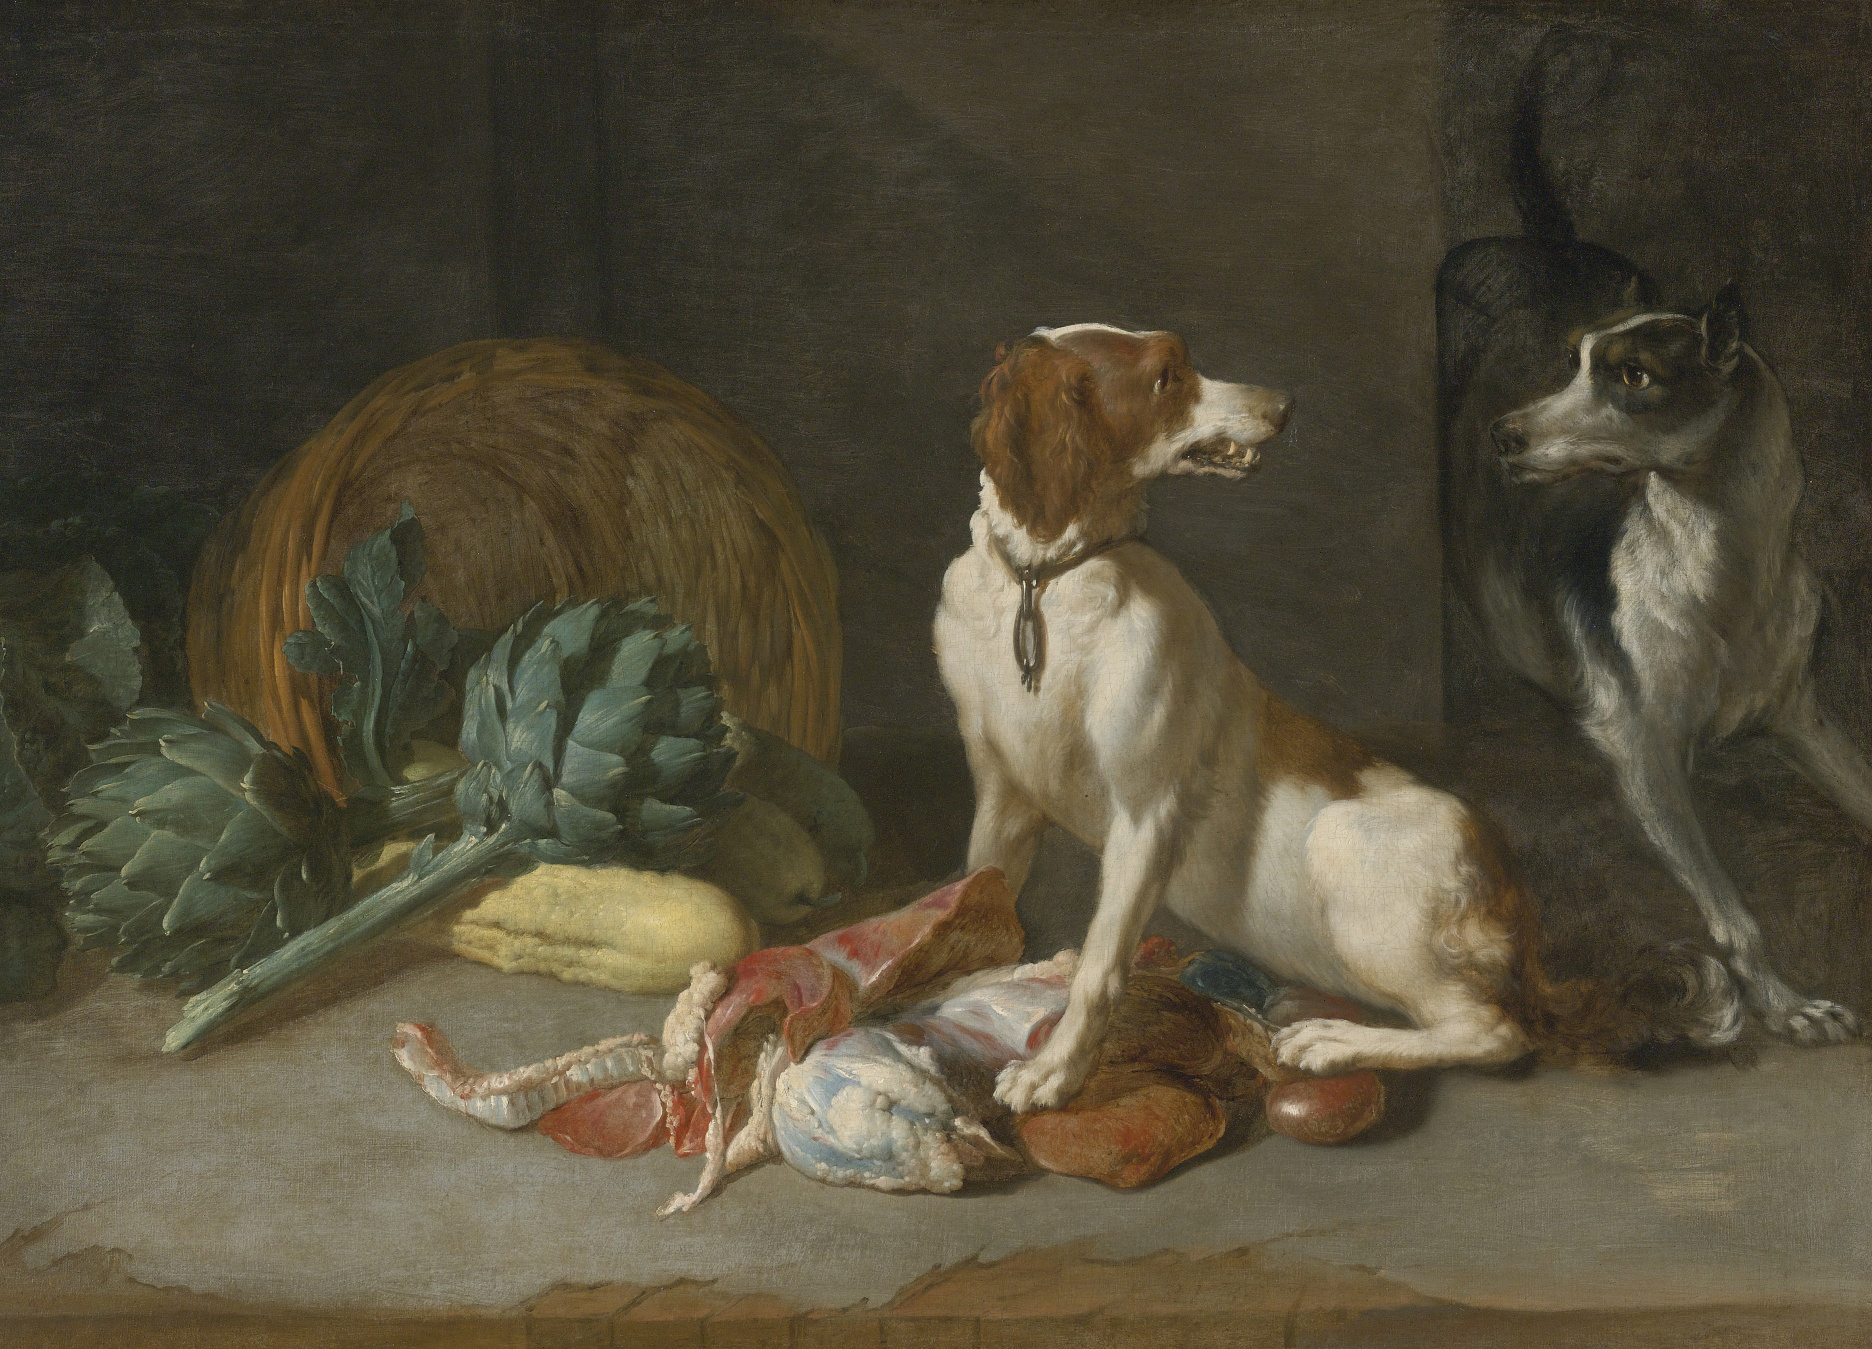 Художник Pieter van Boucle Two Hounds with Artichokes краски природы Альберт Сафиуллин